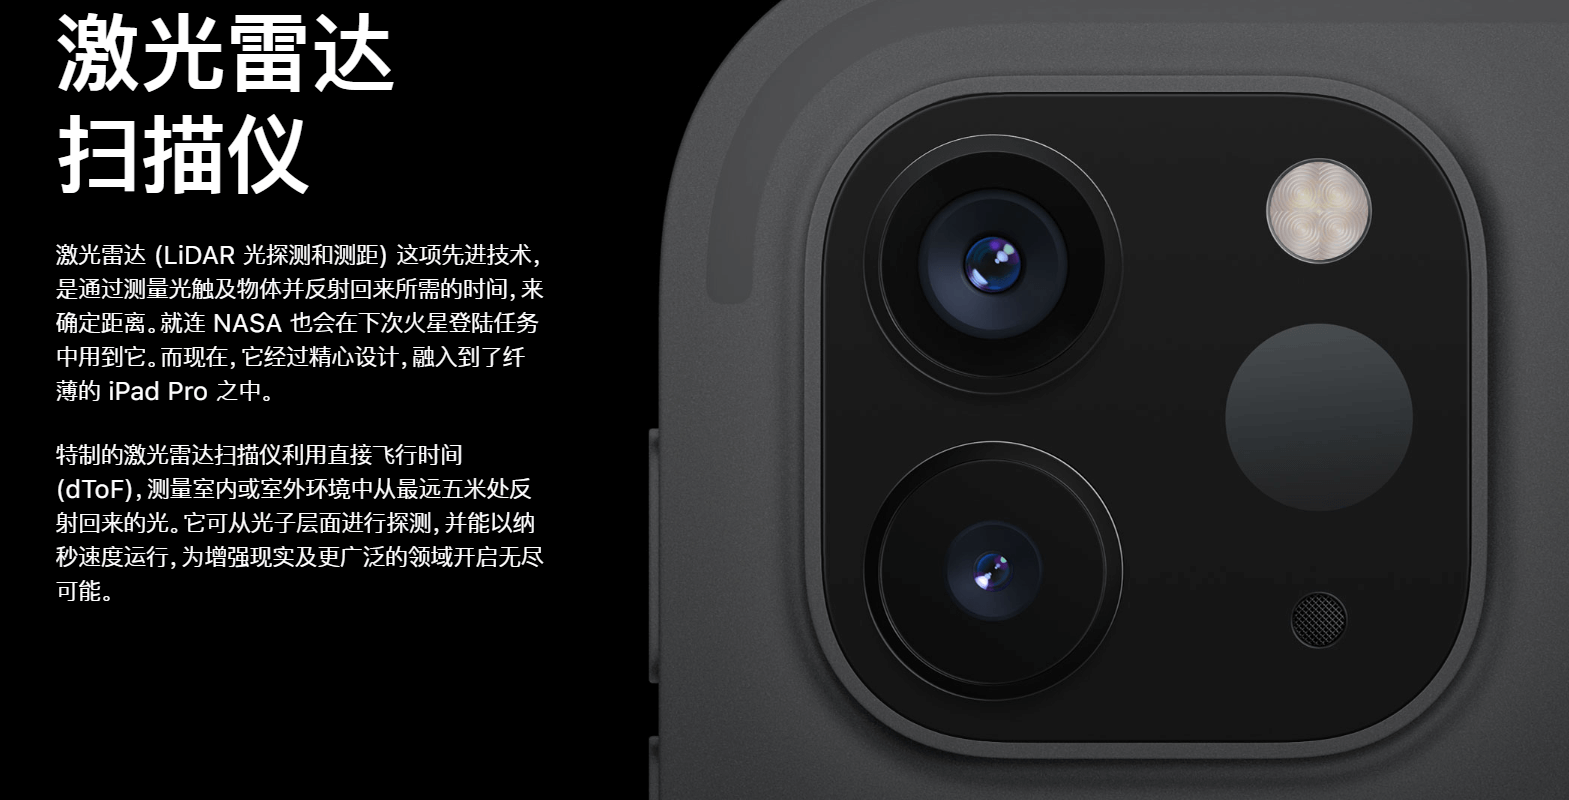 iPad Pro 2020 LiDAR scanner